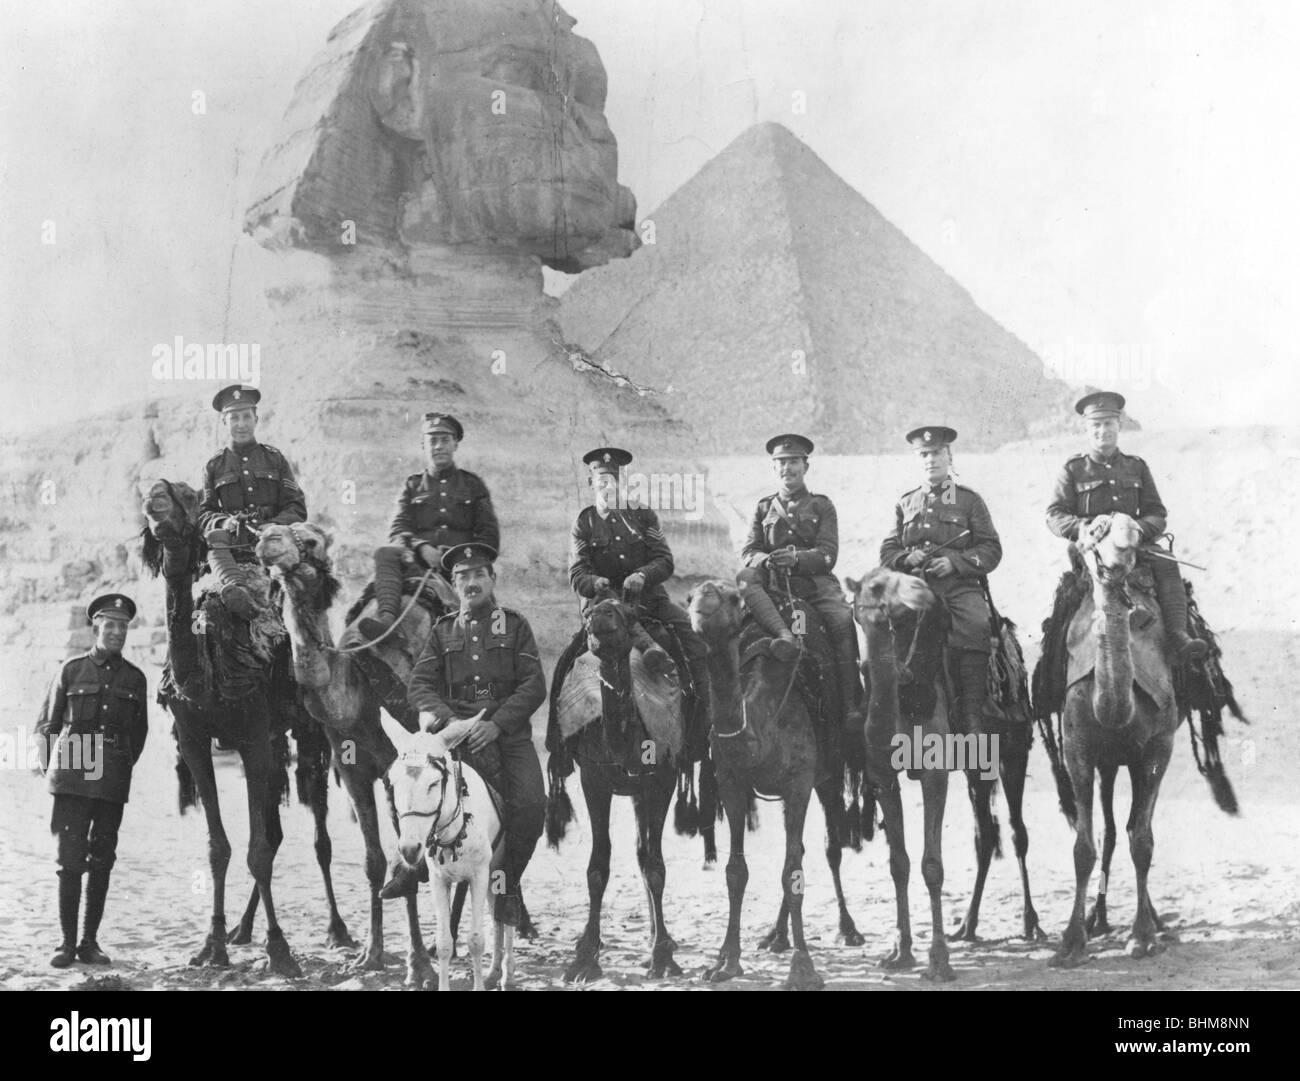 Jewish Legionaries on camels, Gizeh, Egypt, World War I, 1915-1918. - Stock Image